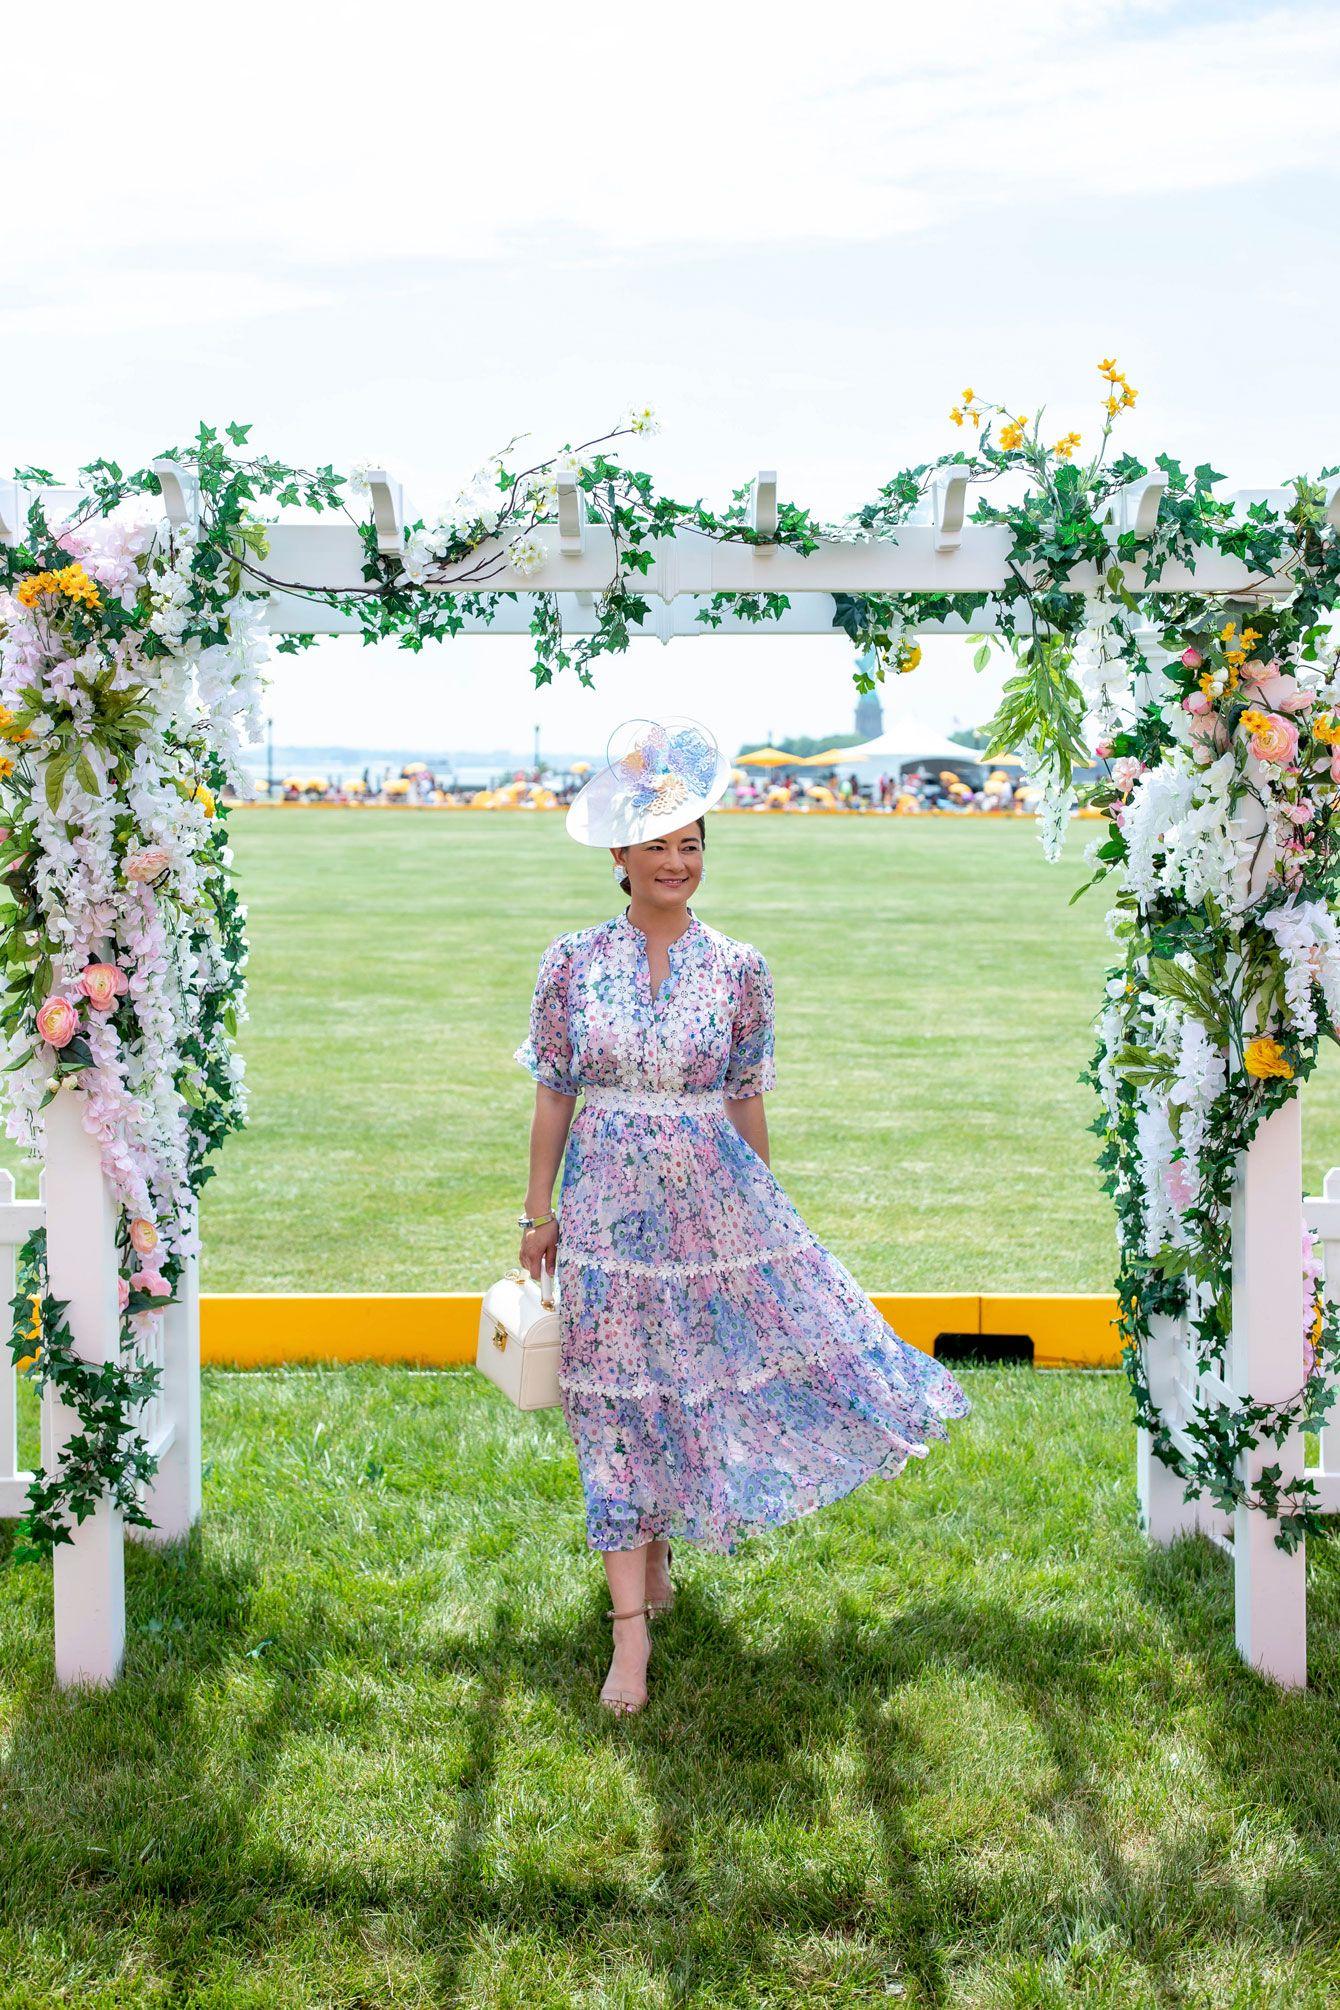 80a520cbe64 Veuve Clicquot Polo Classic 2018 | Best of Pinterest: Fashion | Polo ...